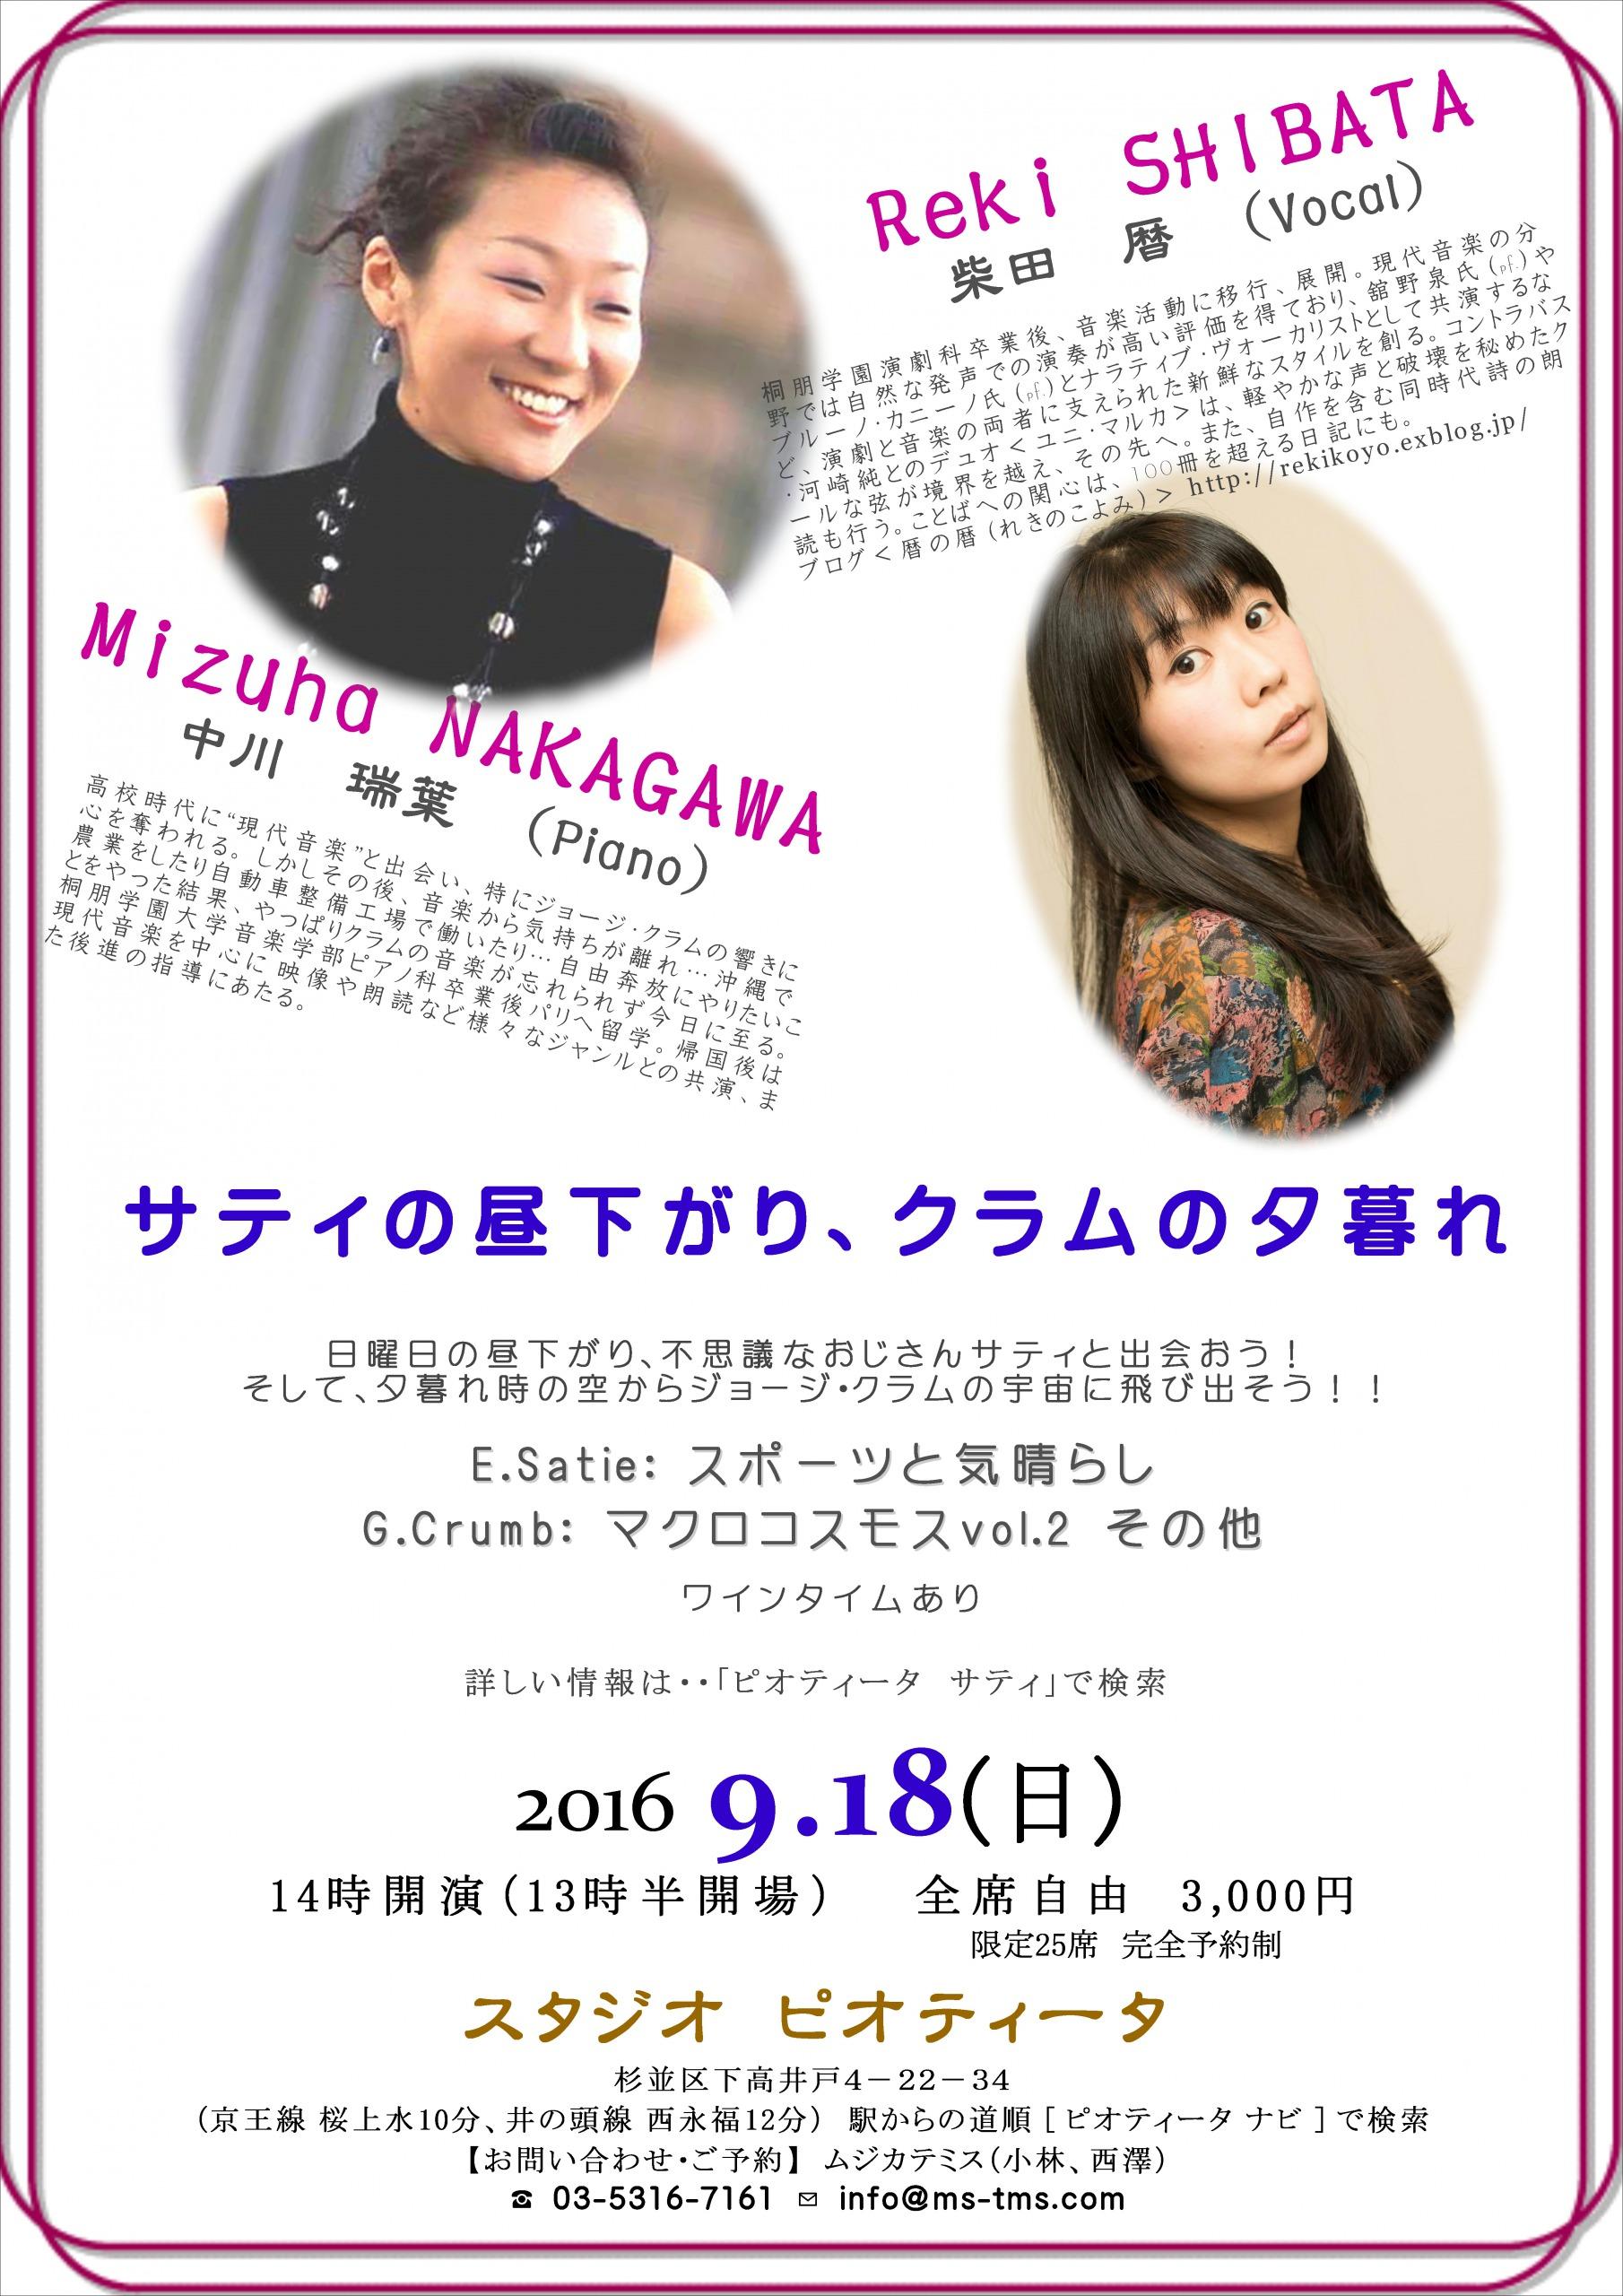 s_MizuhaRekiJPG3